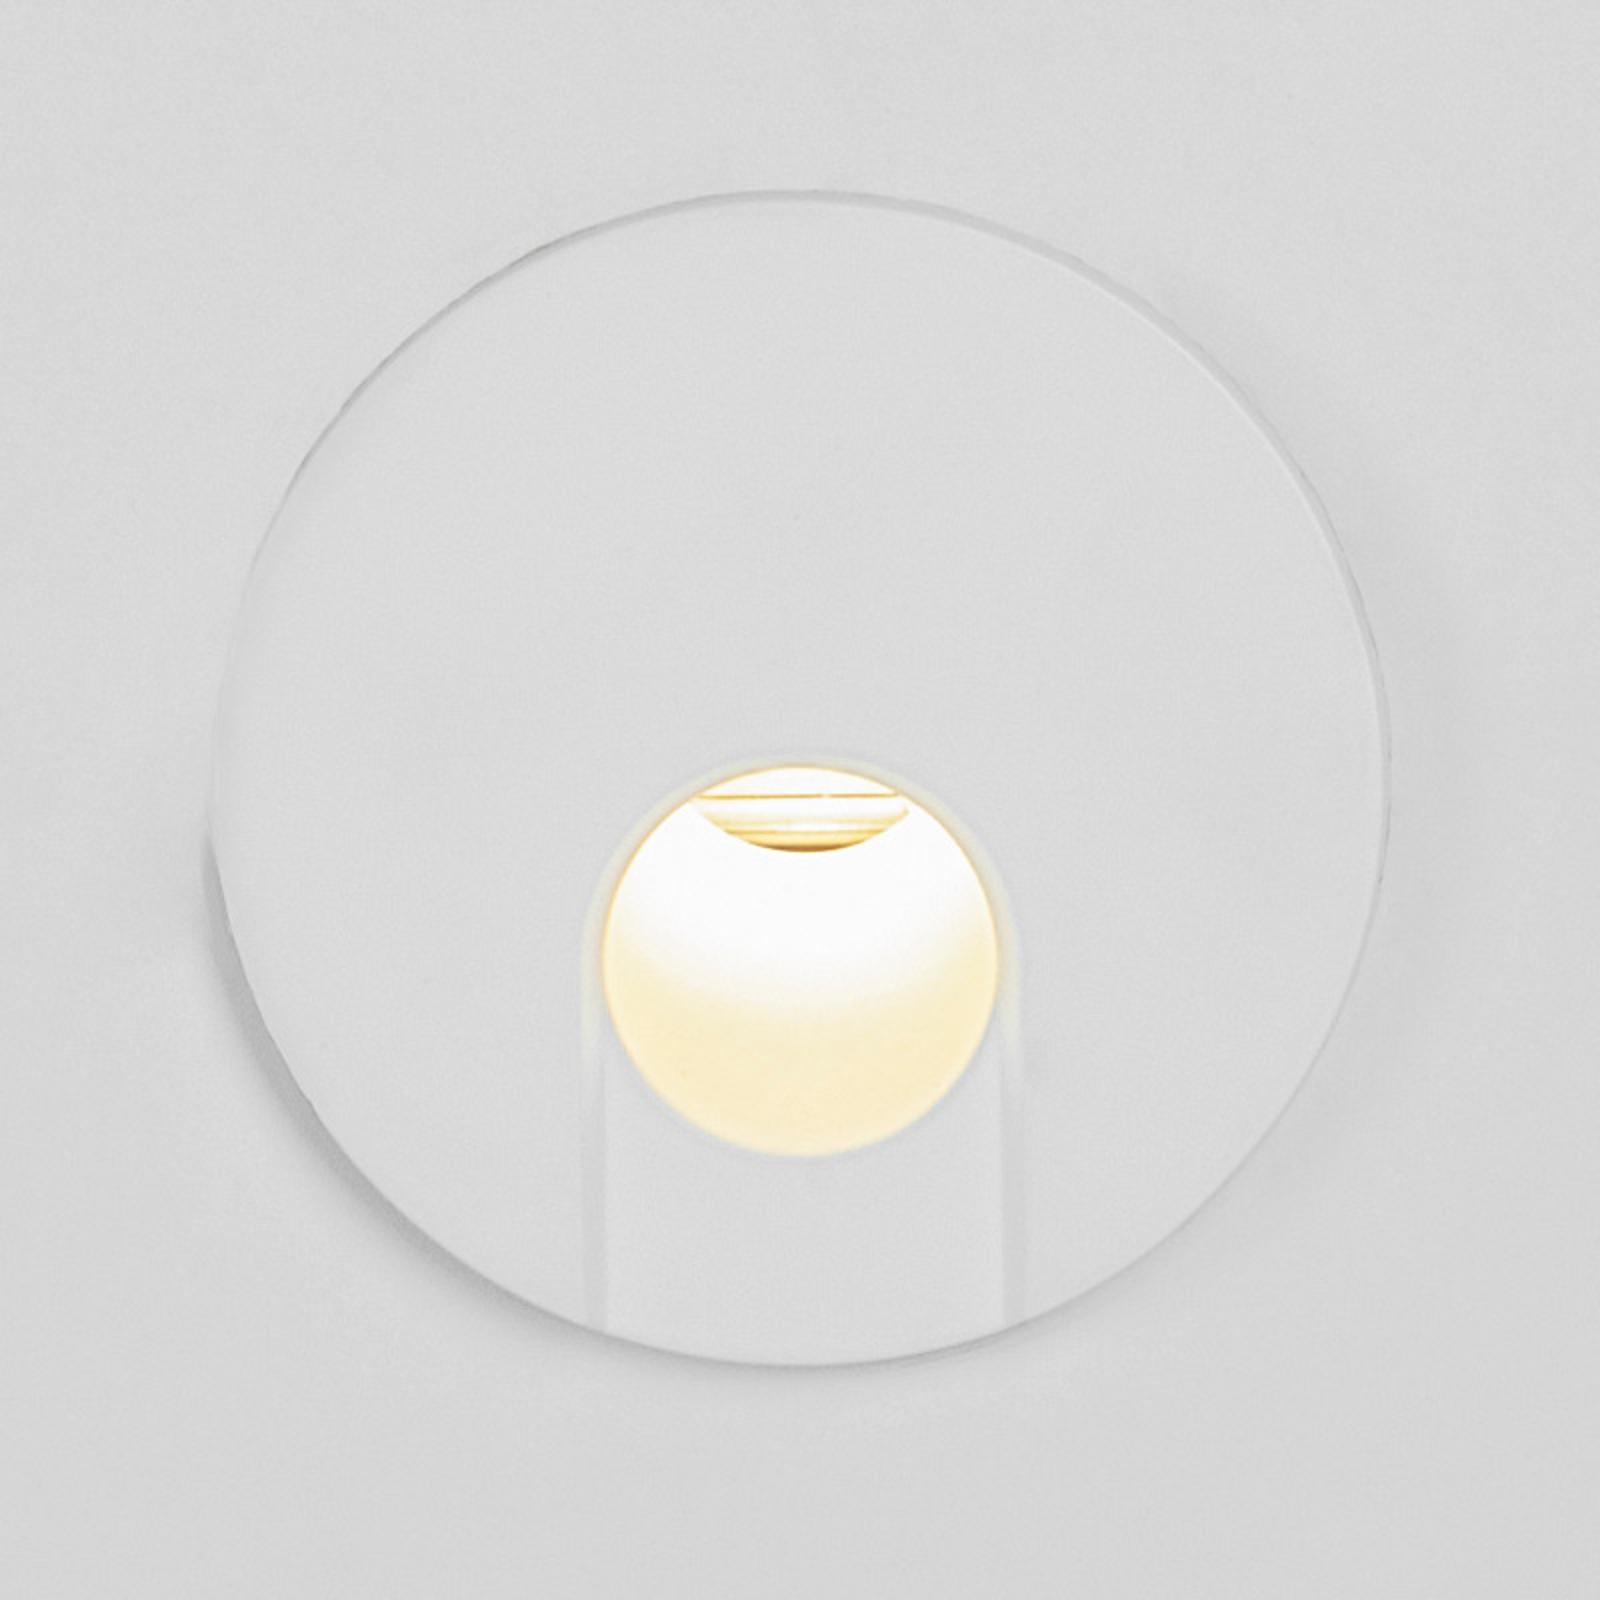 BRUMBERG Wall Kit68 rückversetzt rund weiß